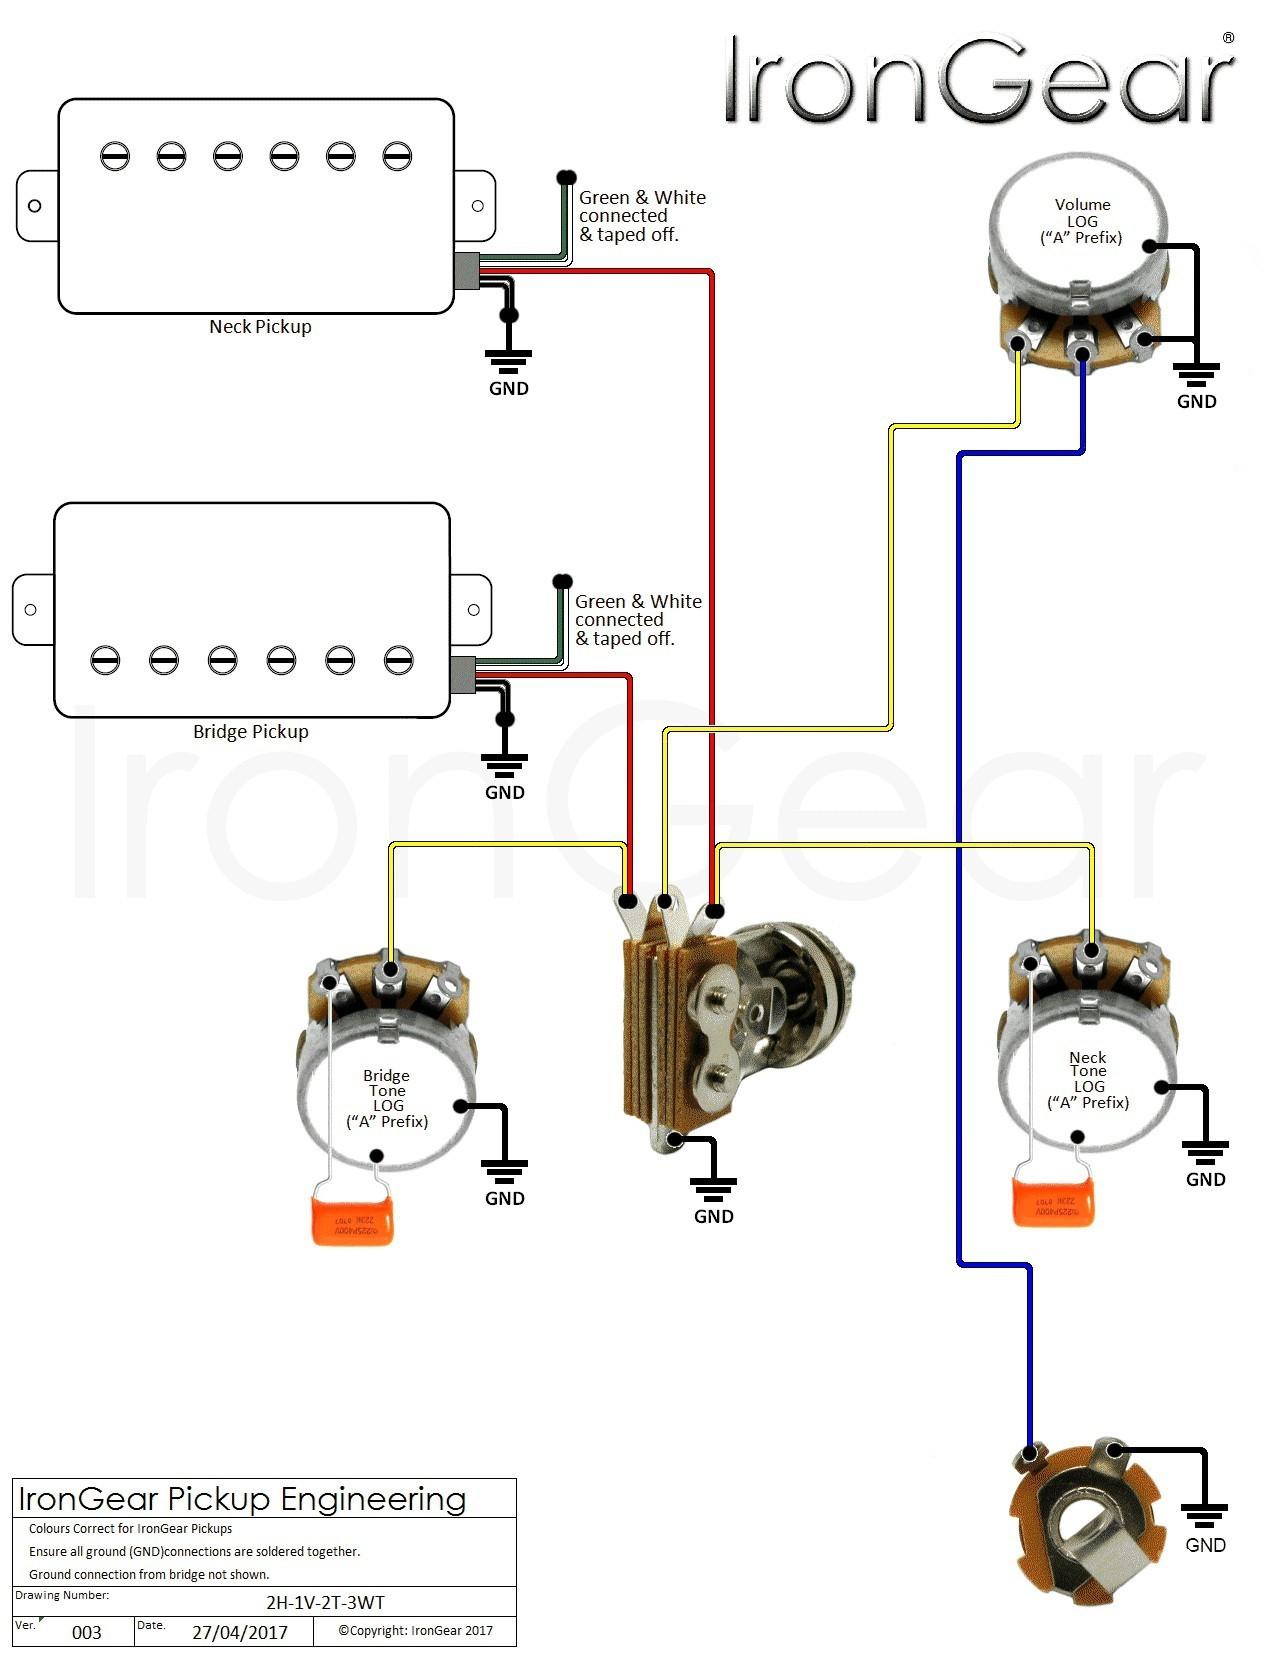 tbx wiring diagram sgo calendoo de \u2022 Telecaster Wiring Schematic p90 wiring diagram tbx ica vipie de u2022 rh ica vipie de fender tbx wiring diagram stratocaster tbx wiring diagram